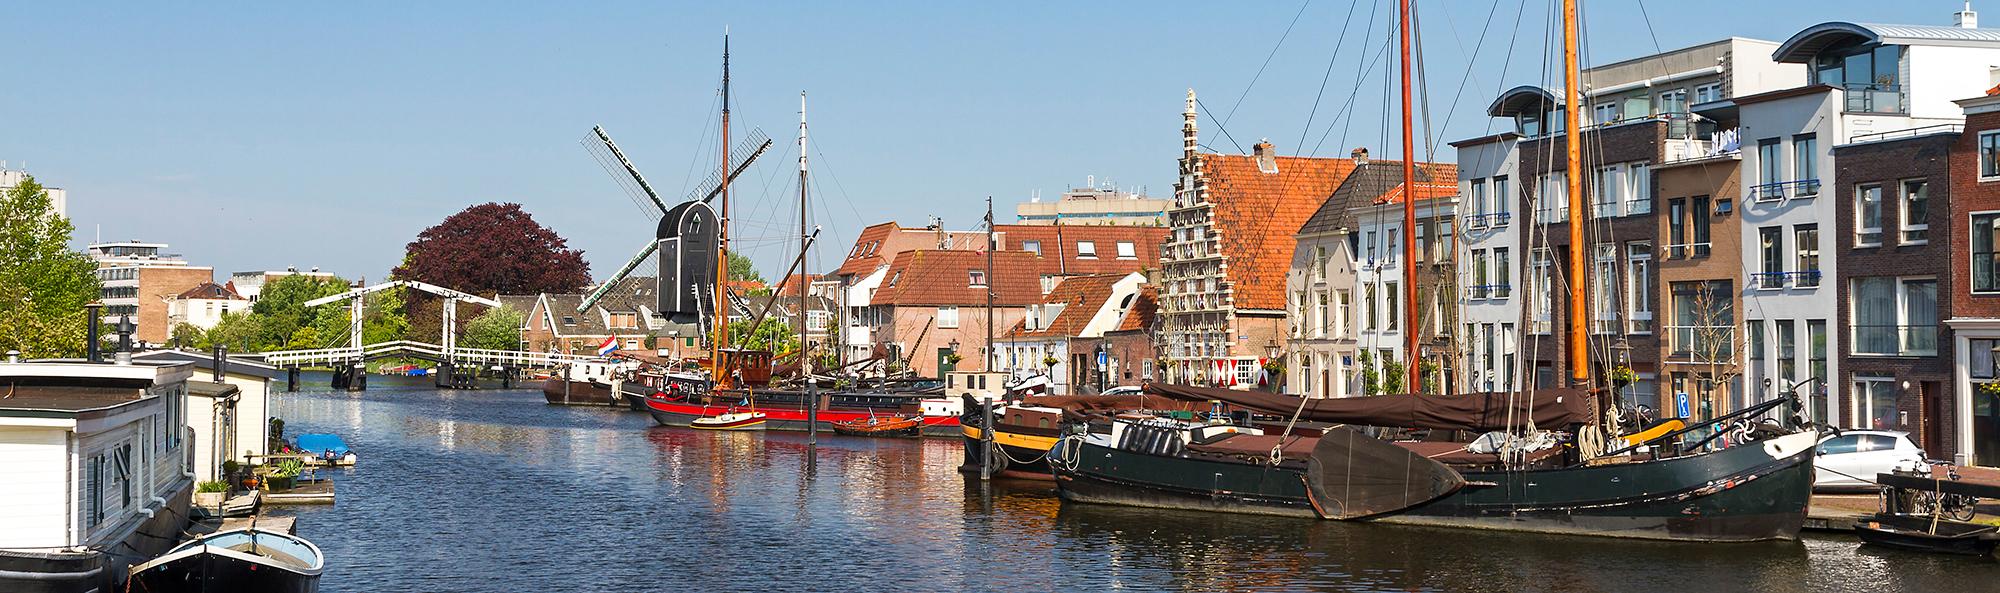 Leiden Singel